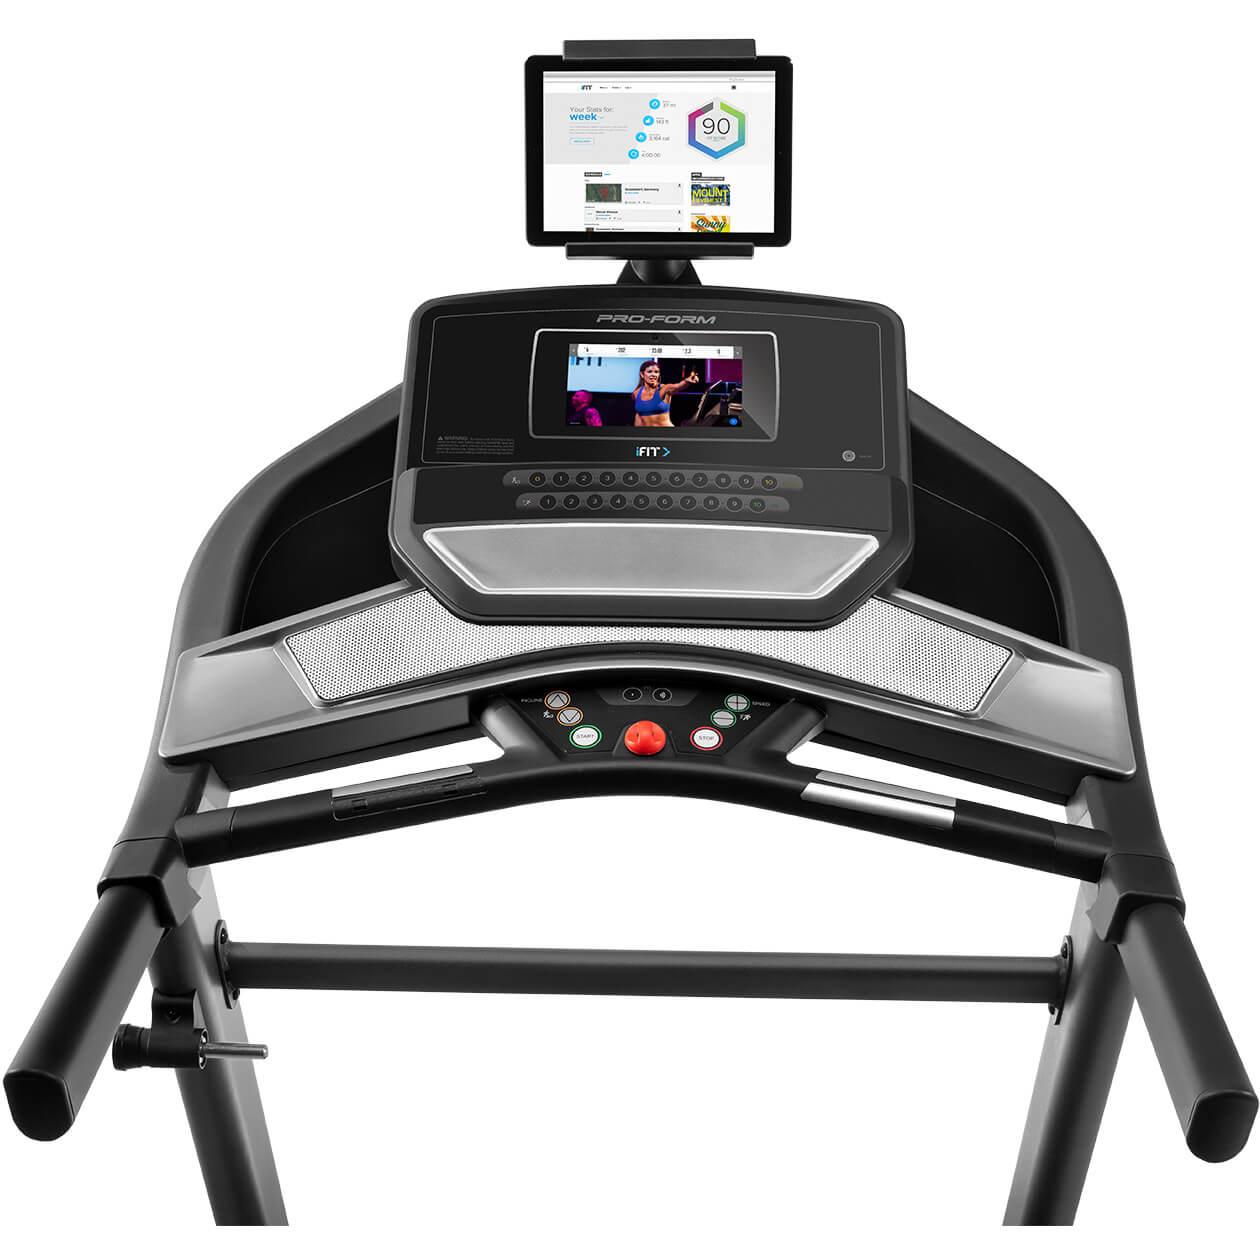 proform performance 400 treadmill manual